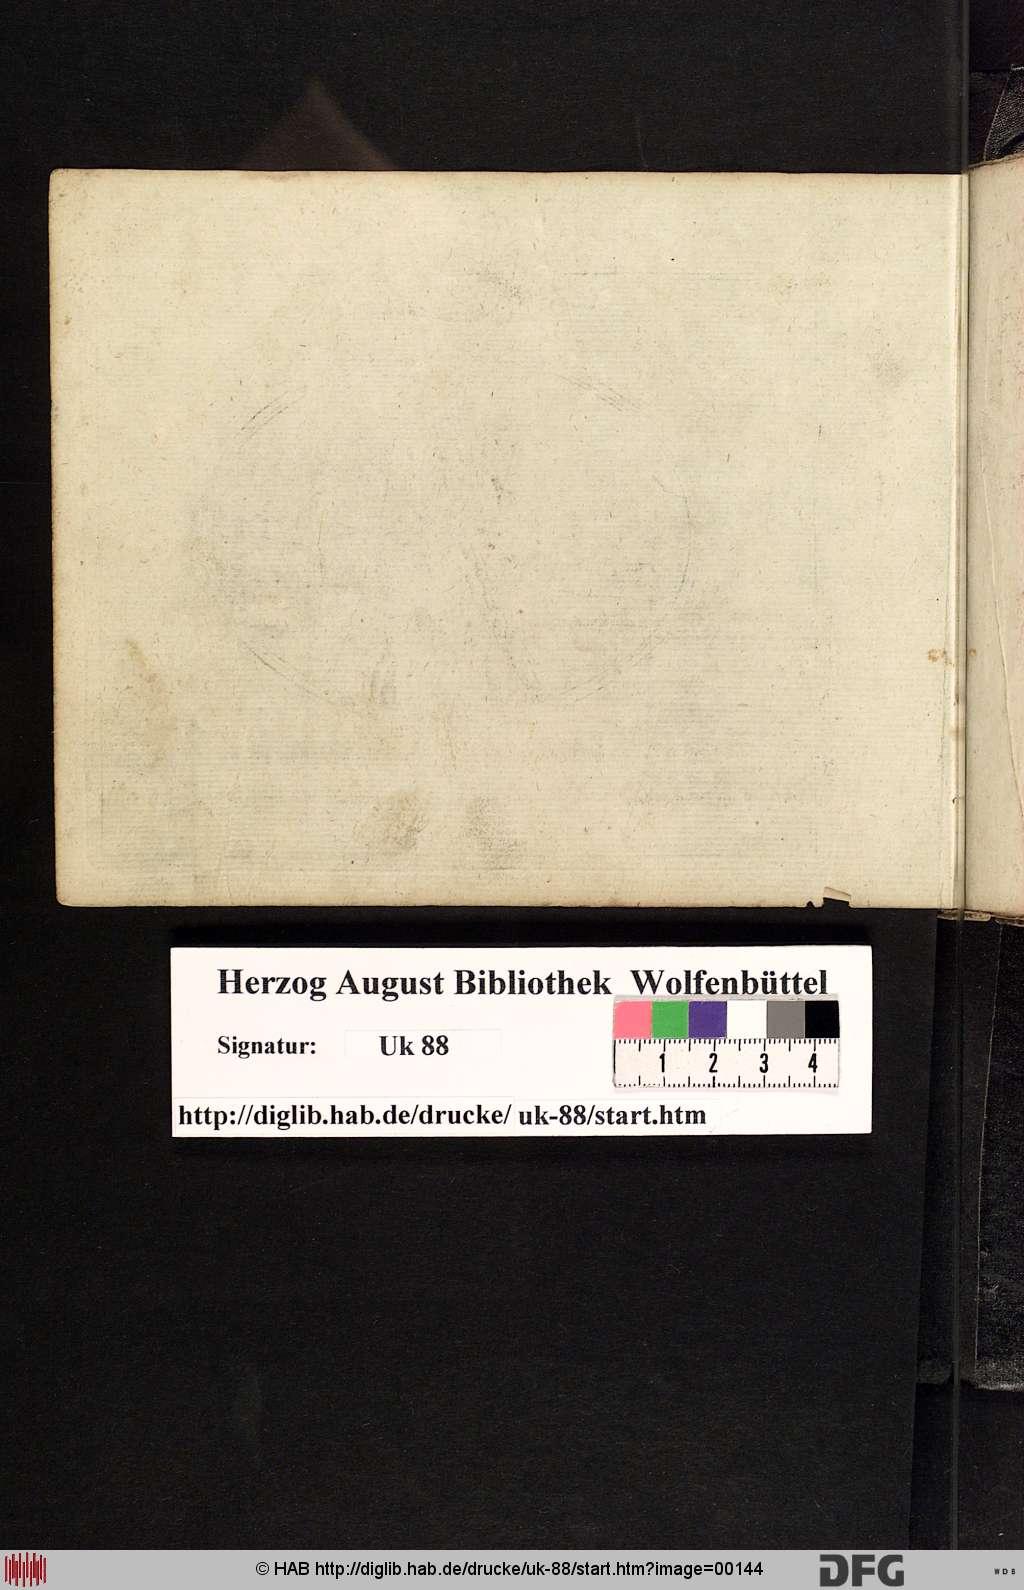 http://diglib.hab.de/drucke/uk-88/00144.jpg